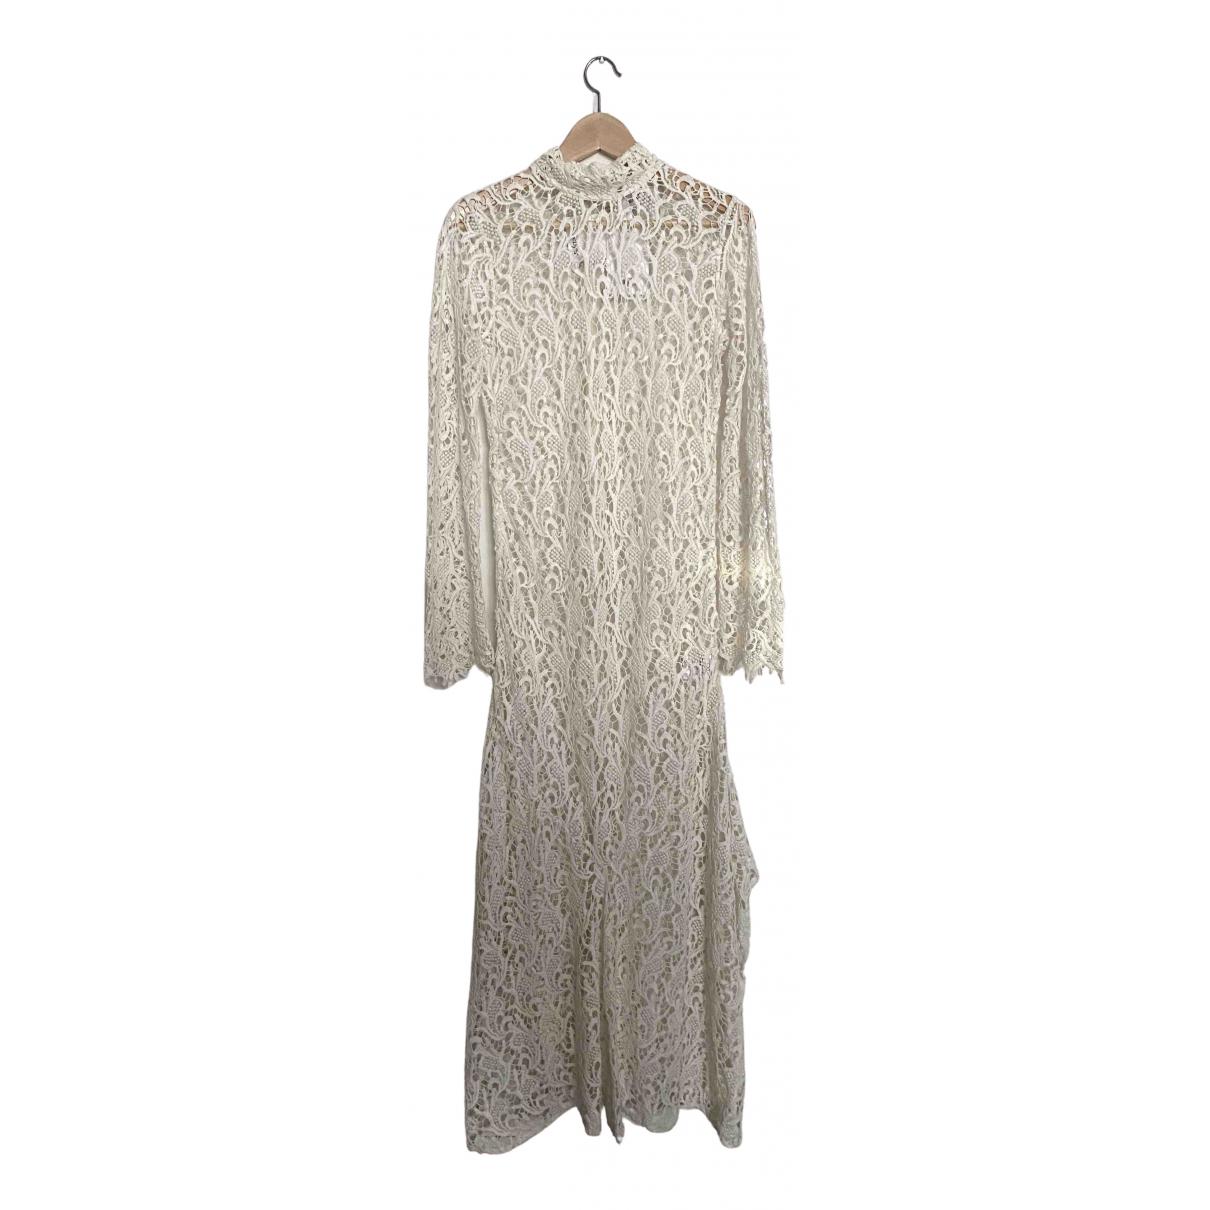 Rodebjer N Ecru Cotton dress for Women S International